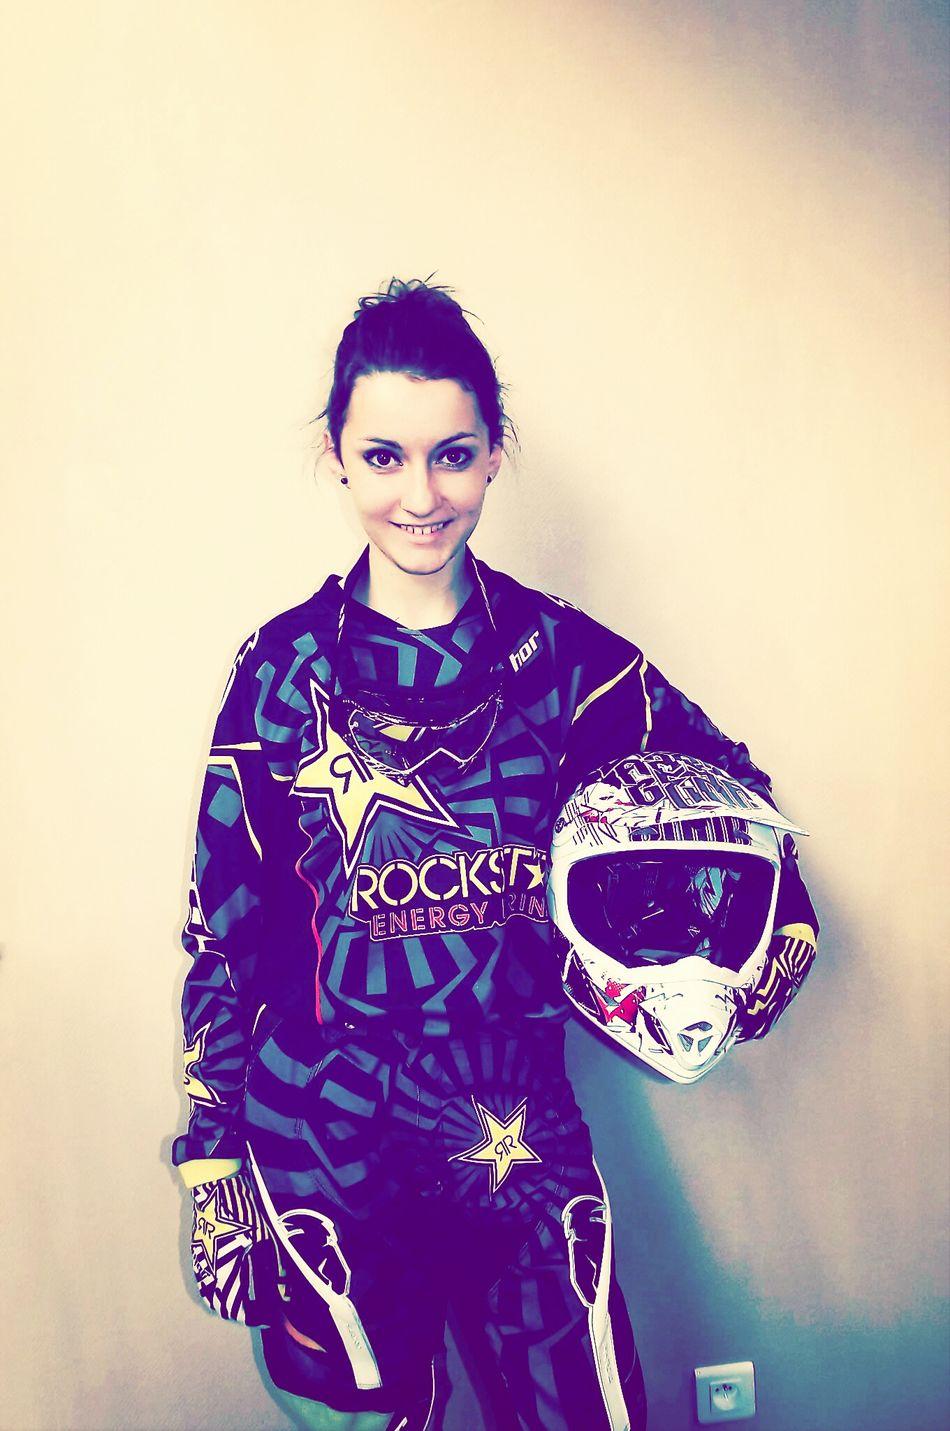 Motocross Racing It's My Life